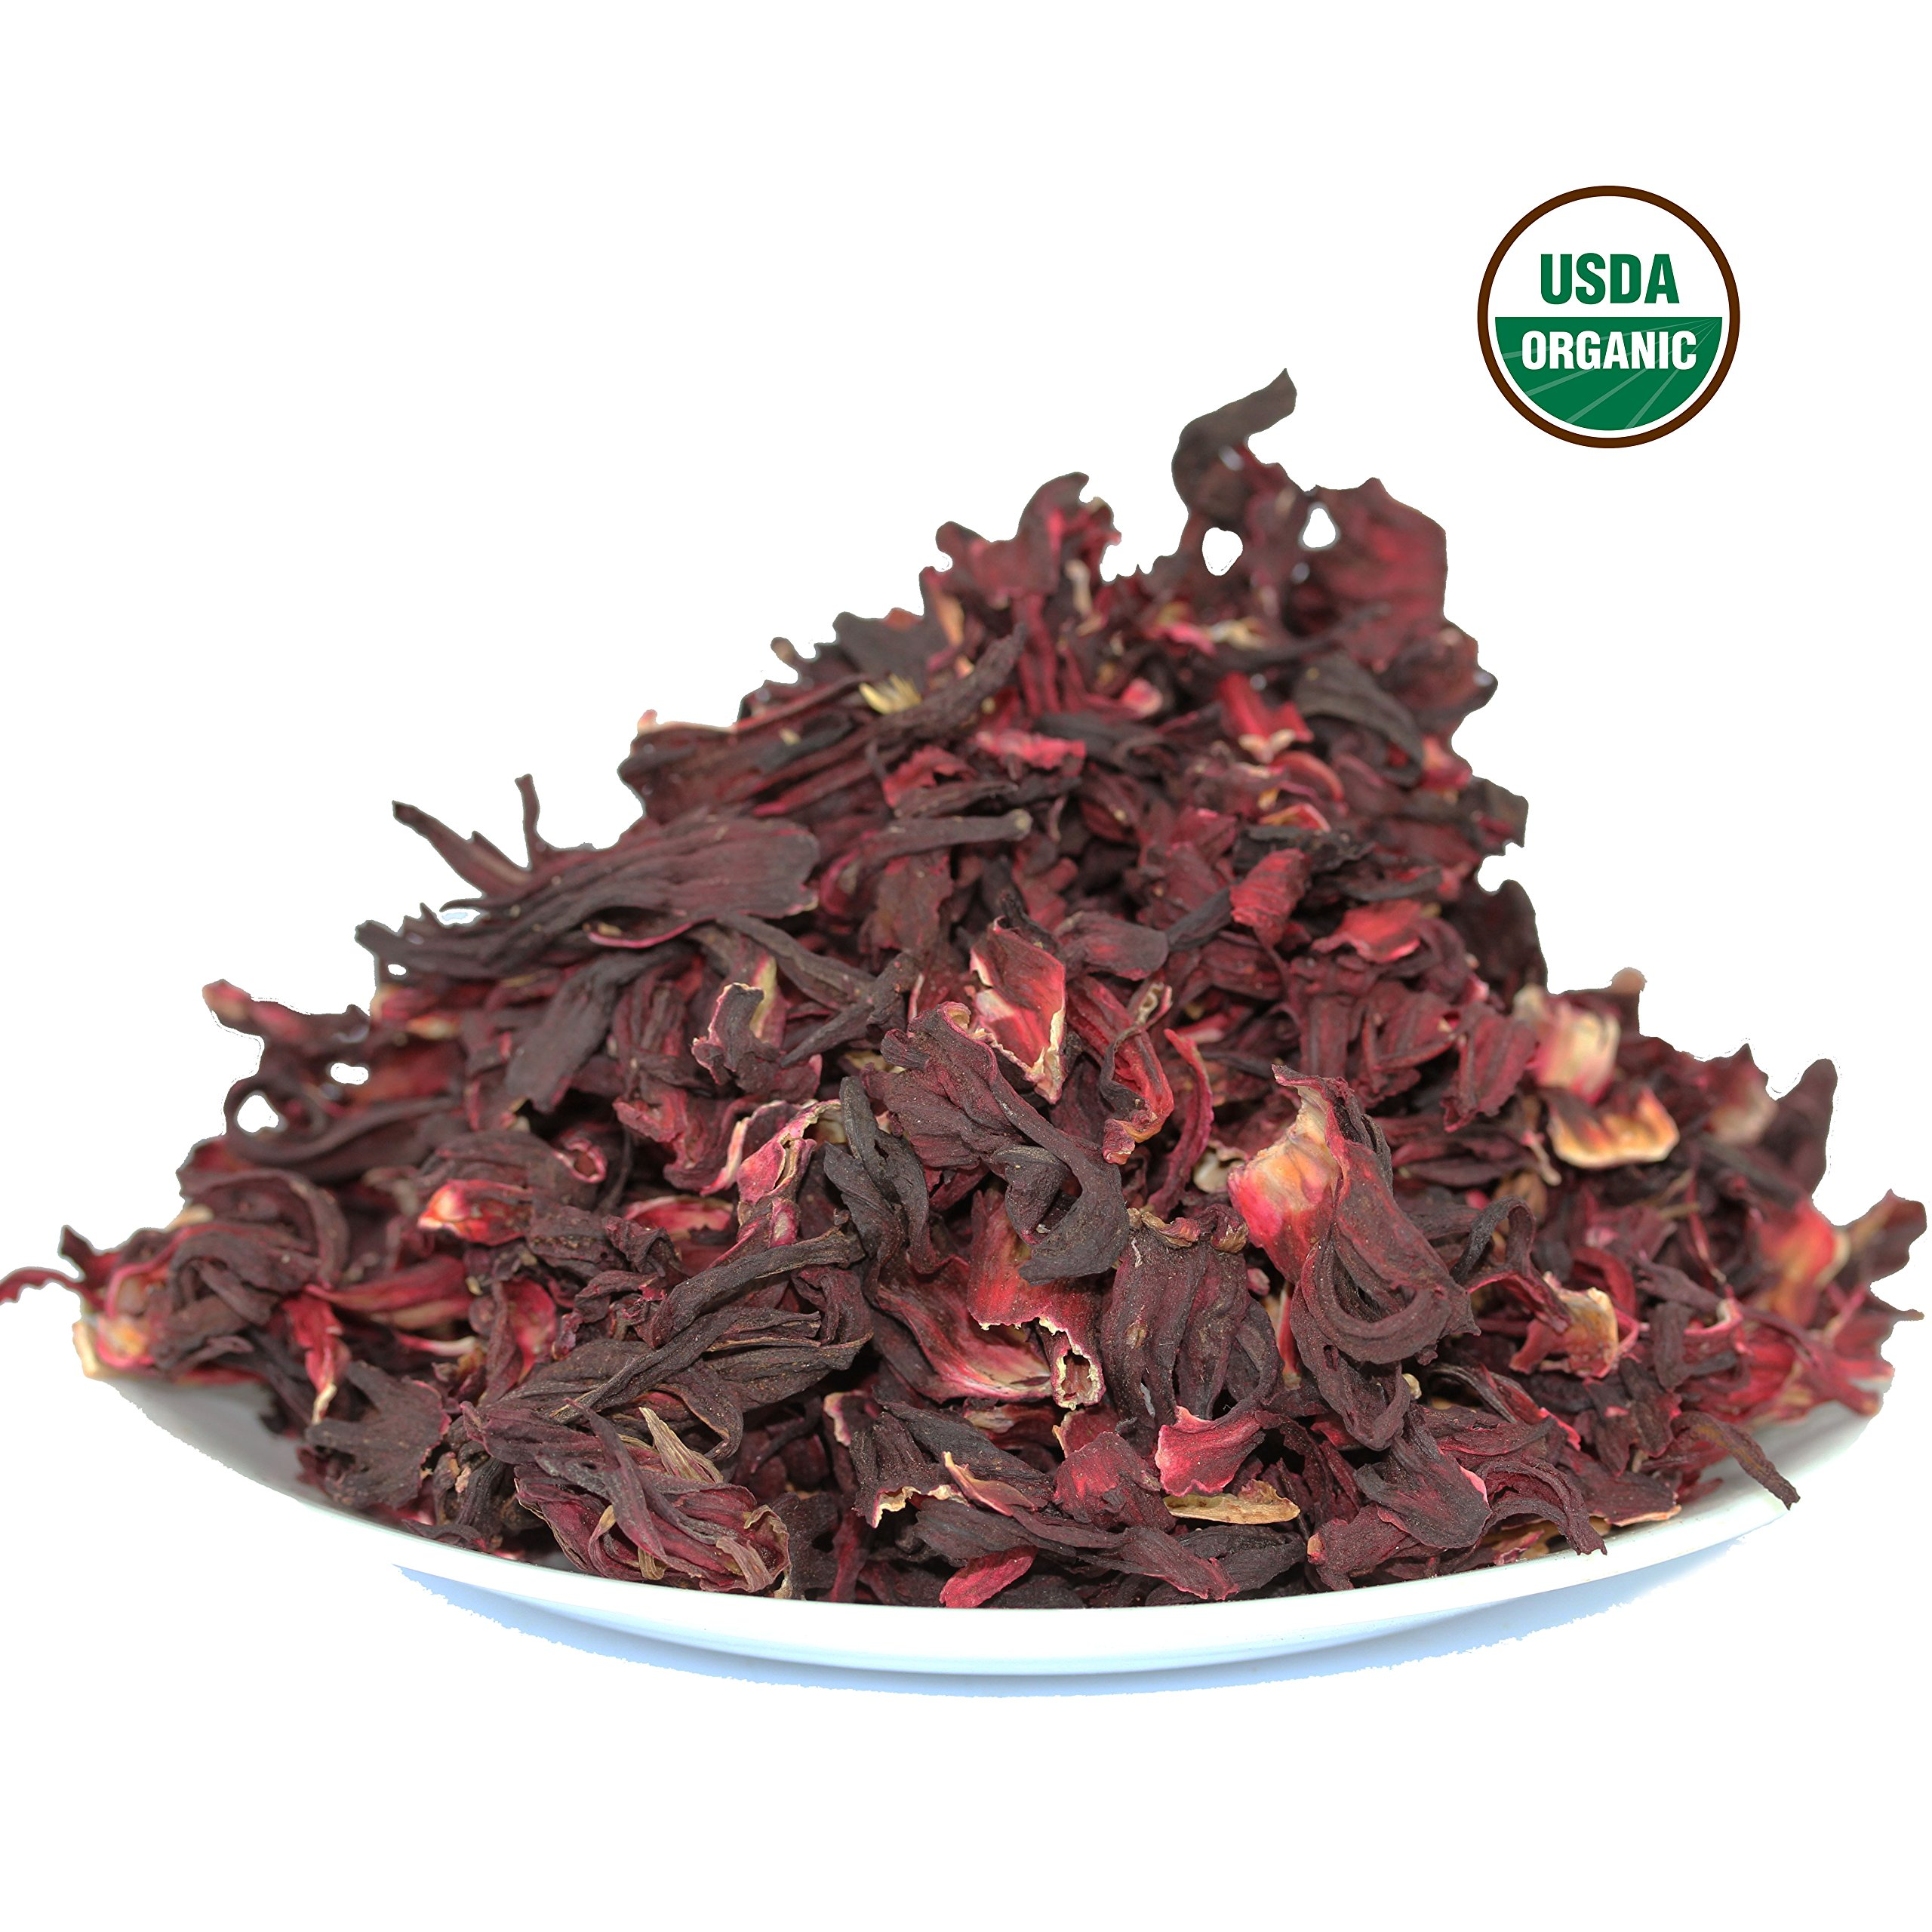 Hibiscus Tea 1LB (16Oz) 100% CERTIFIED Organic Hibiscus Flowers Herbal Tea (WHOLE PETALS), Caffeine Free in 1 lbs. Bulk Resealable Kraft BPA free Bags from U.S. Wellness by U.S. Wellness Naturals (Image #3)